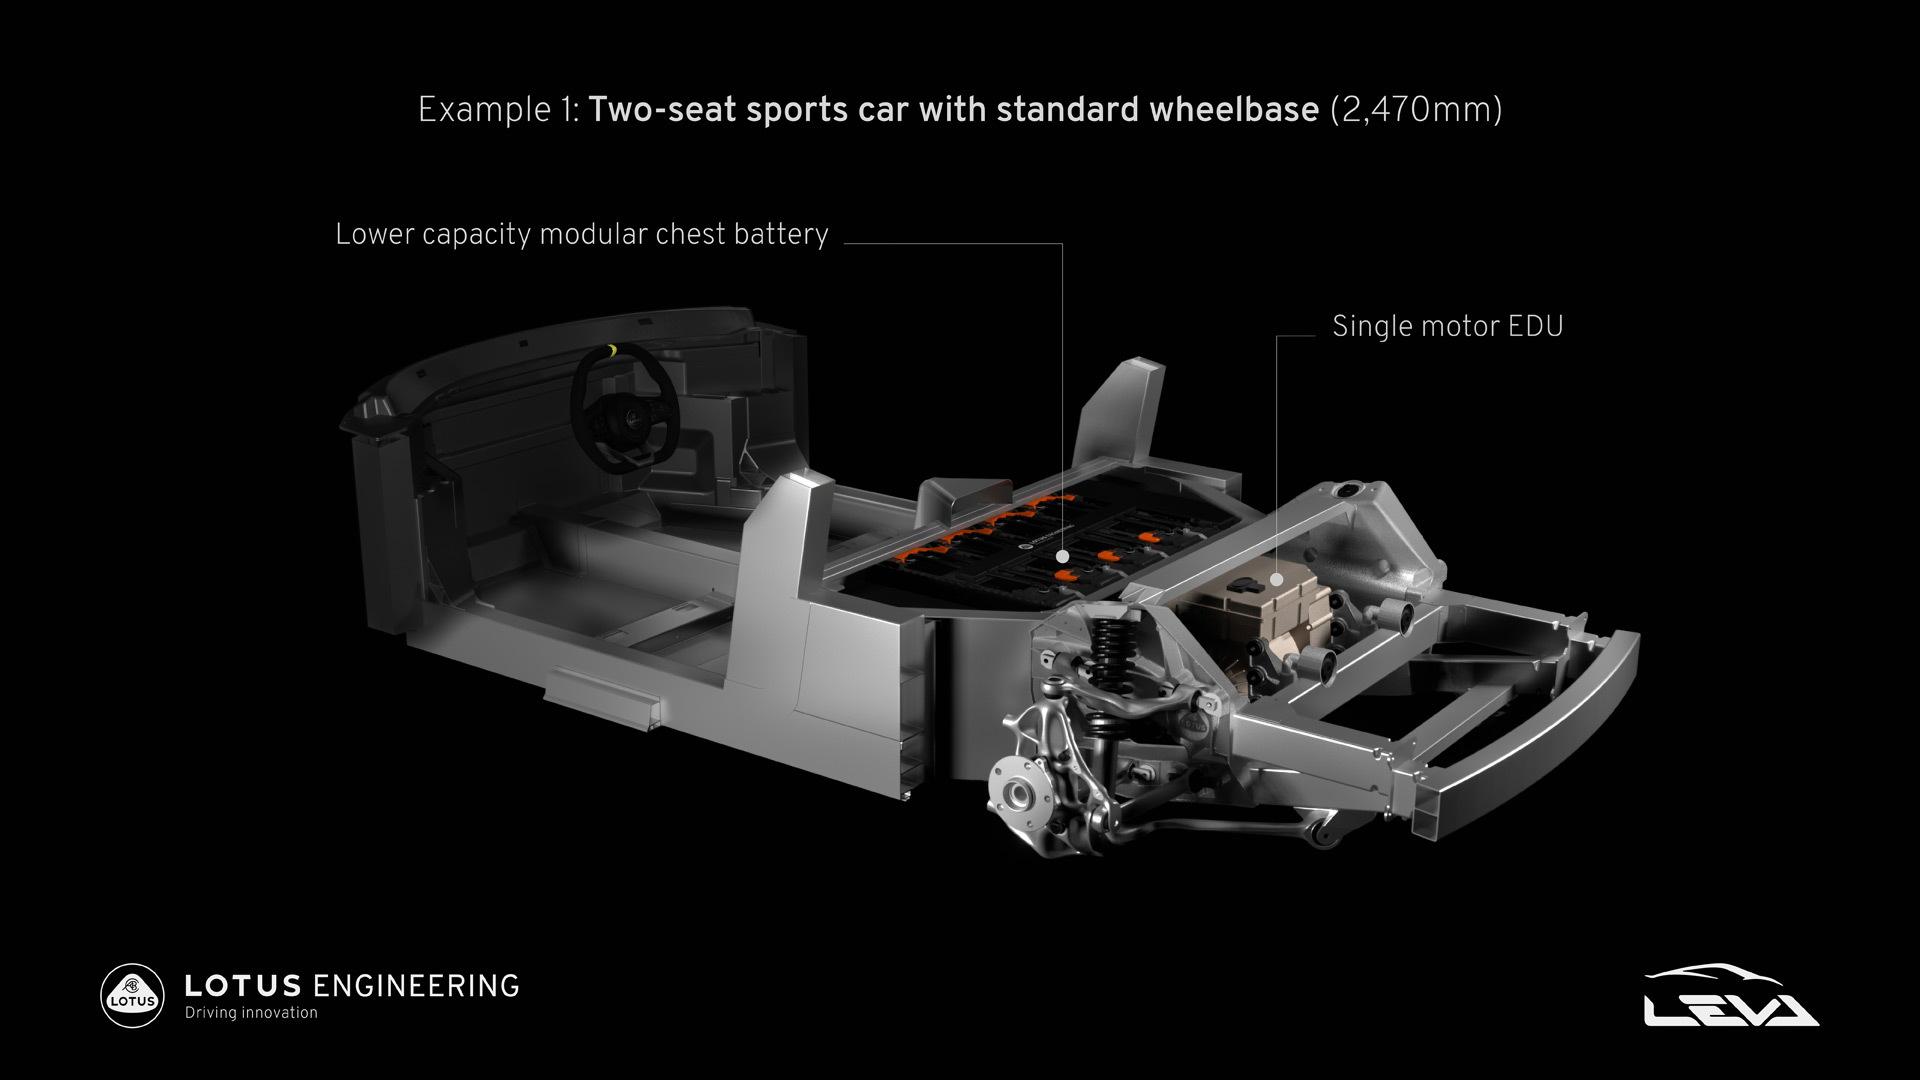 Lotus E-Sports platform (Project LEVA) for short-wheelbase electric sports cars